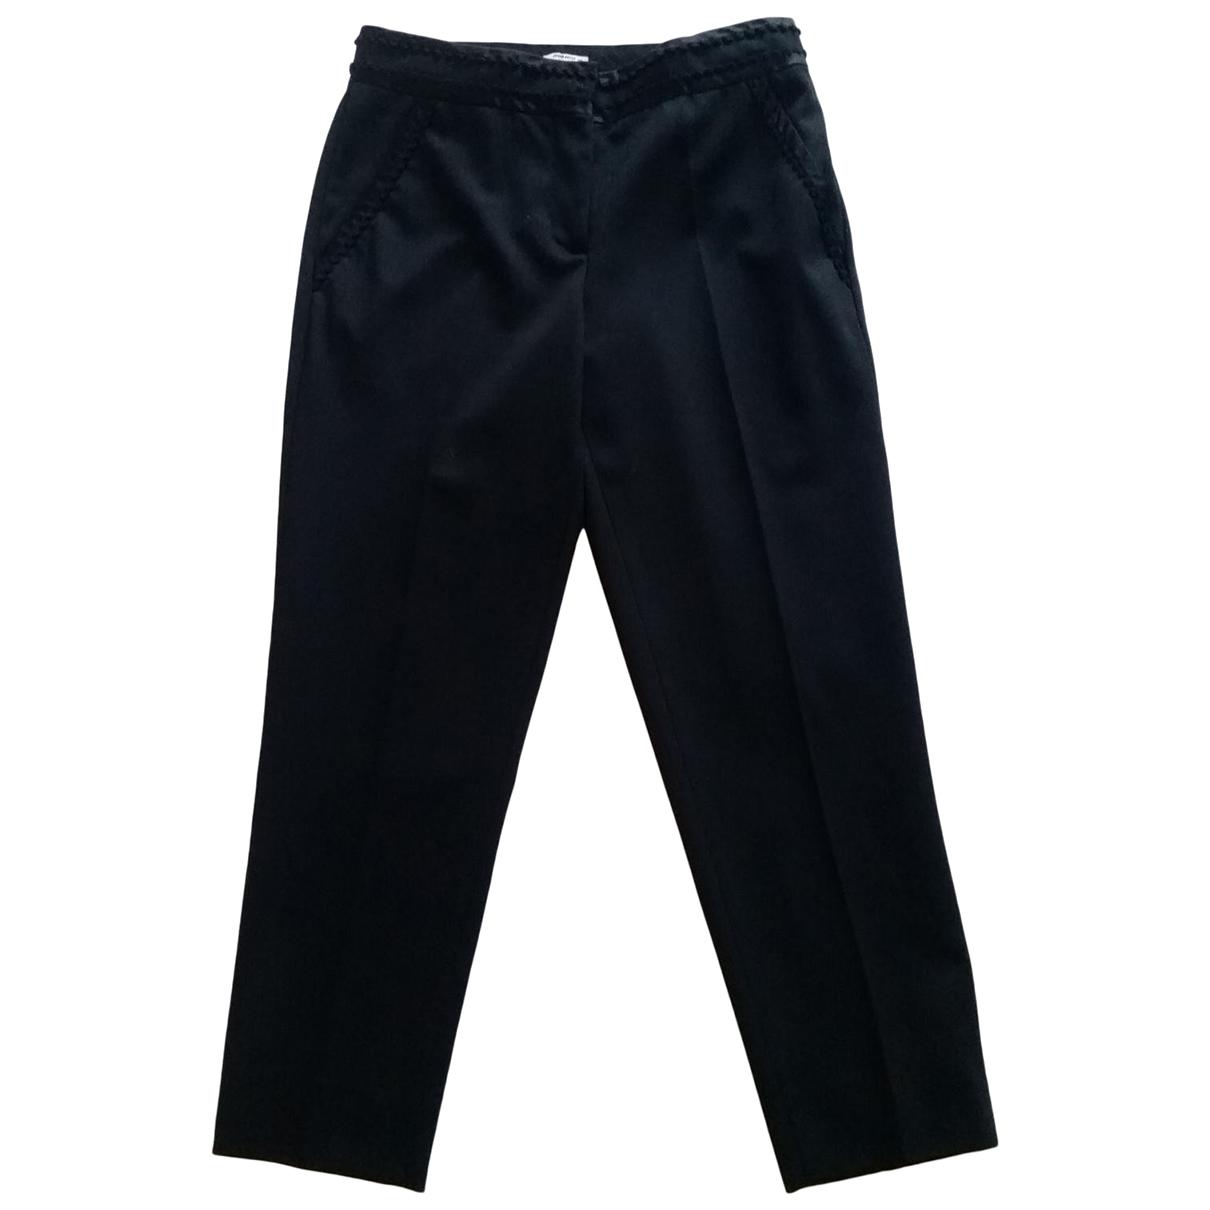 Miu Miu \N Black Wool Trousers for Women 38 IT